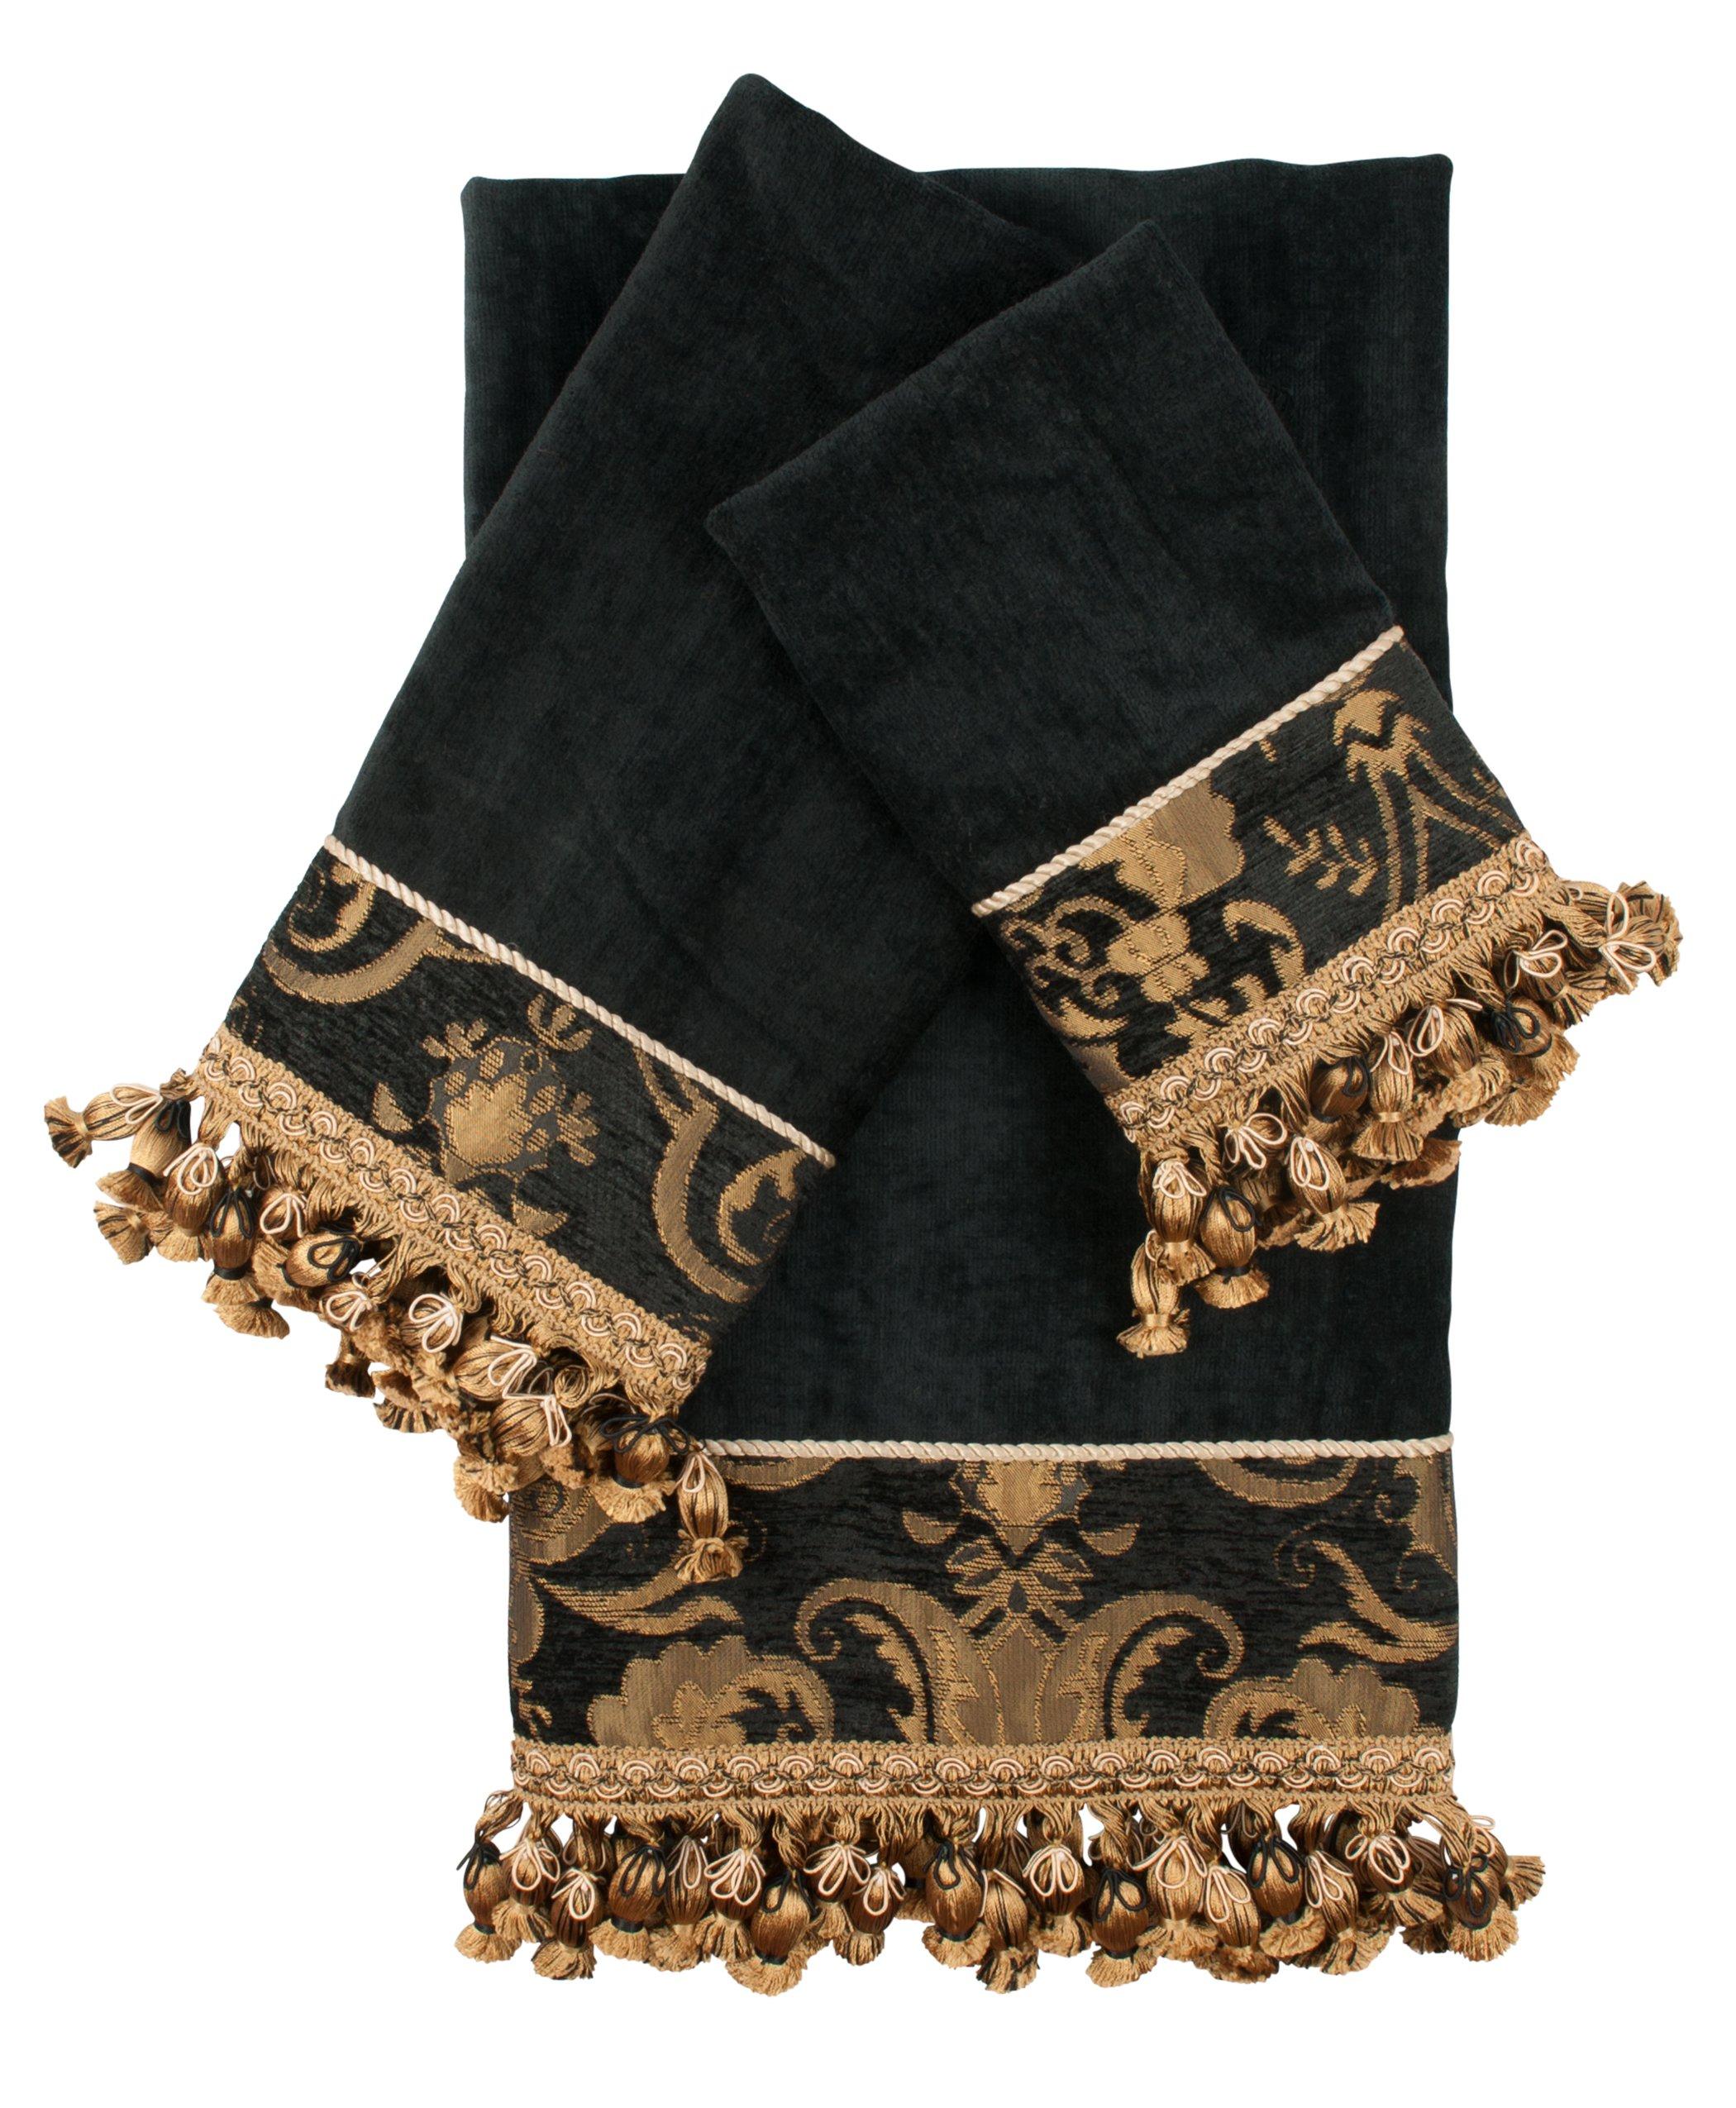 Sherry Kline 3 Piece China Art Decorative Towel Set, Black